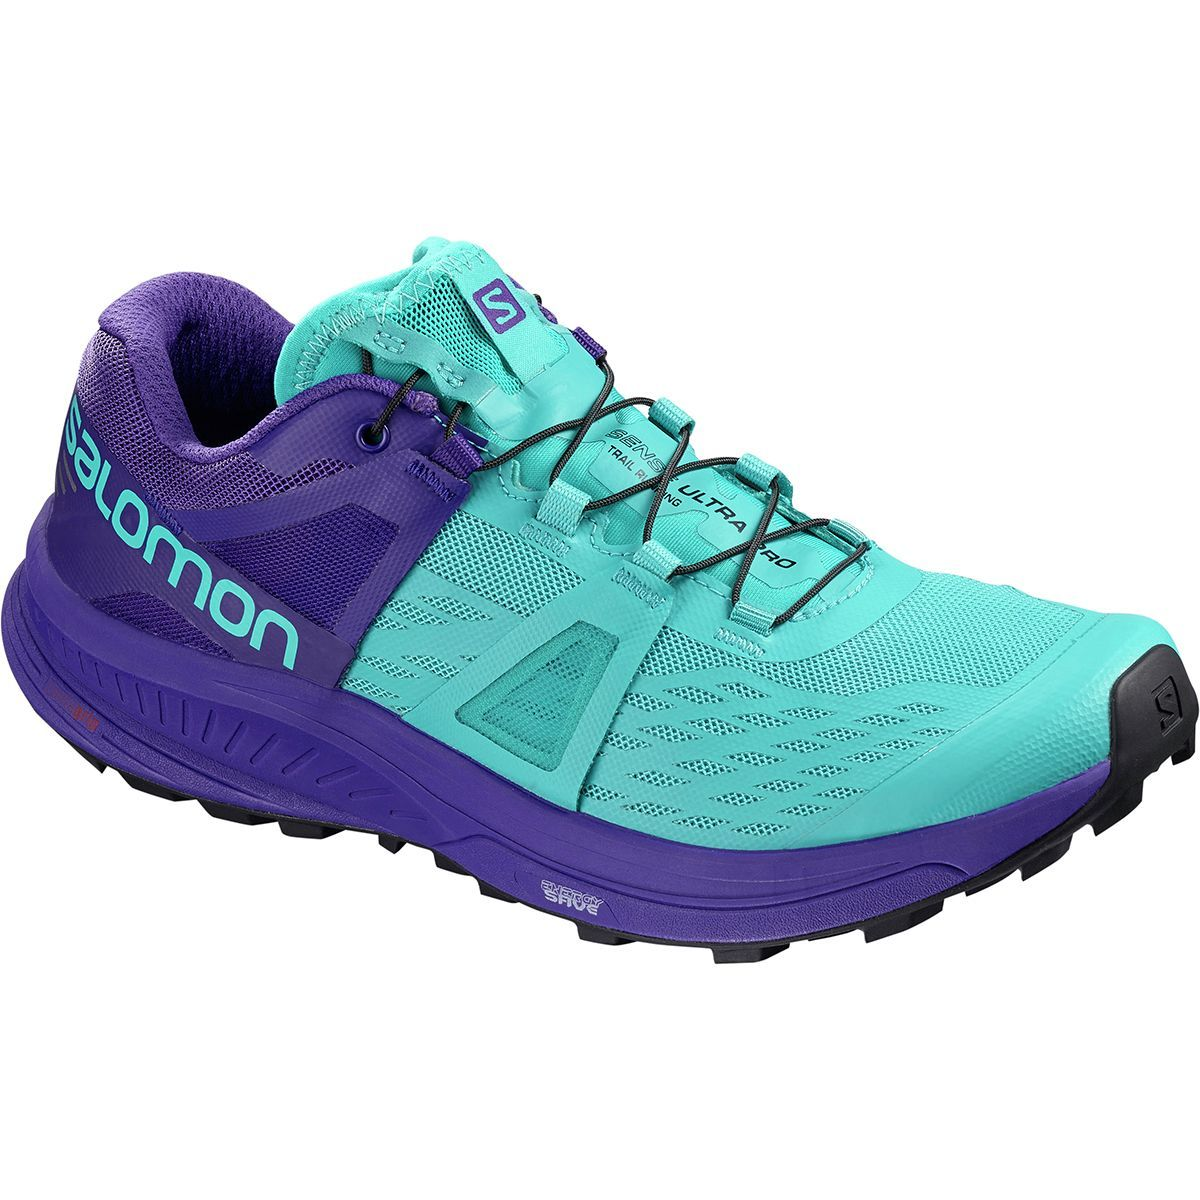 35+ Salomon trail running shoes womens ideas ideas in 2021